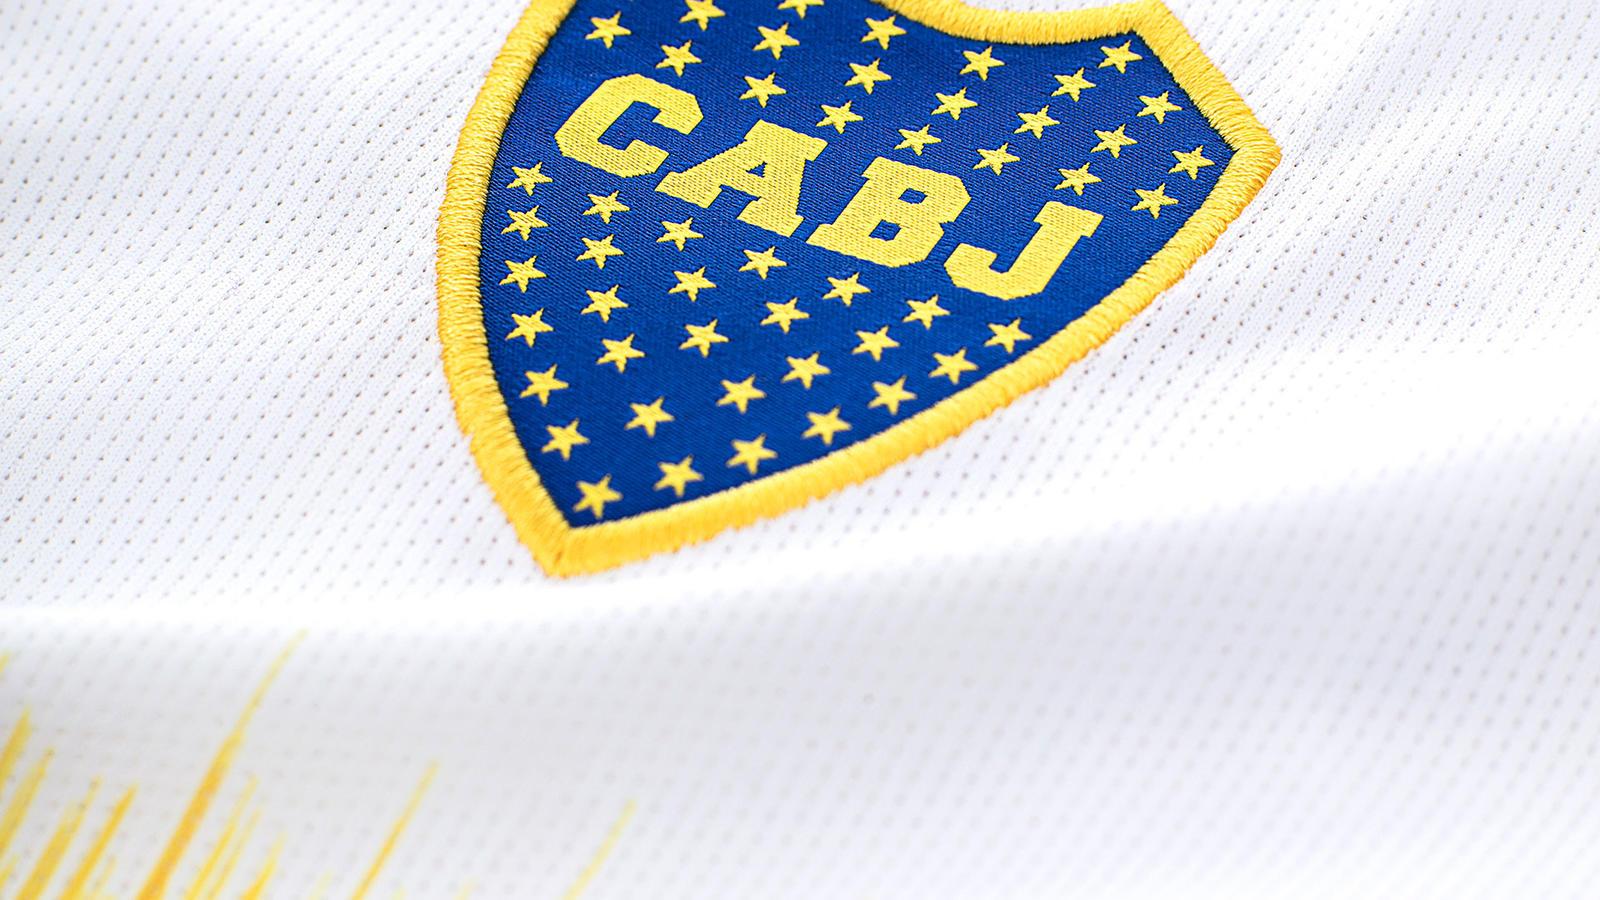 Bocajuniors2018 boca away jersey 01 hd 1600